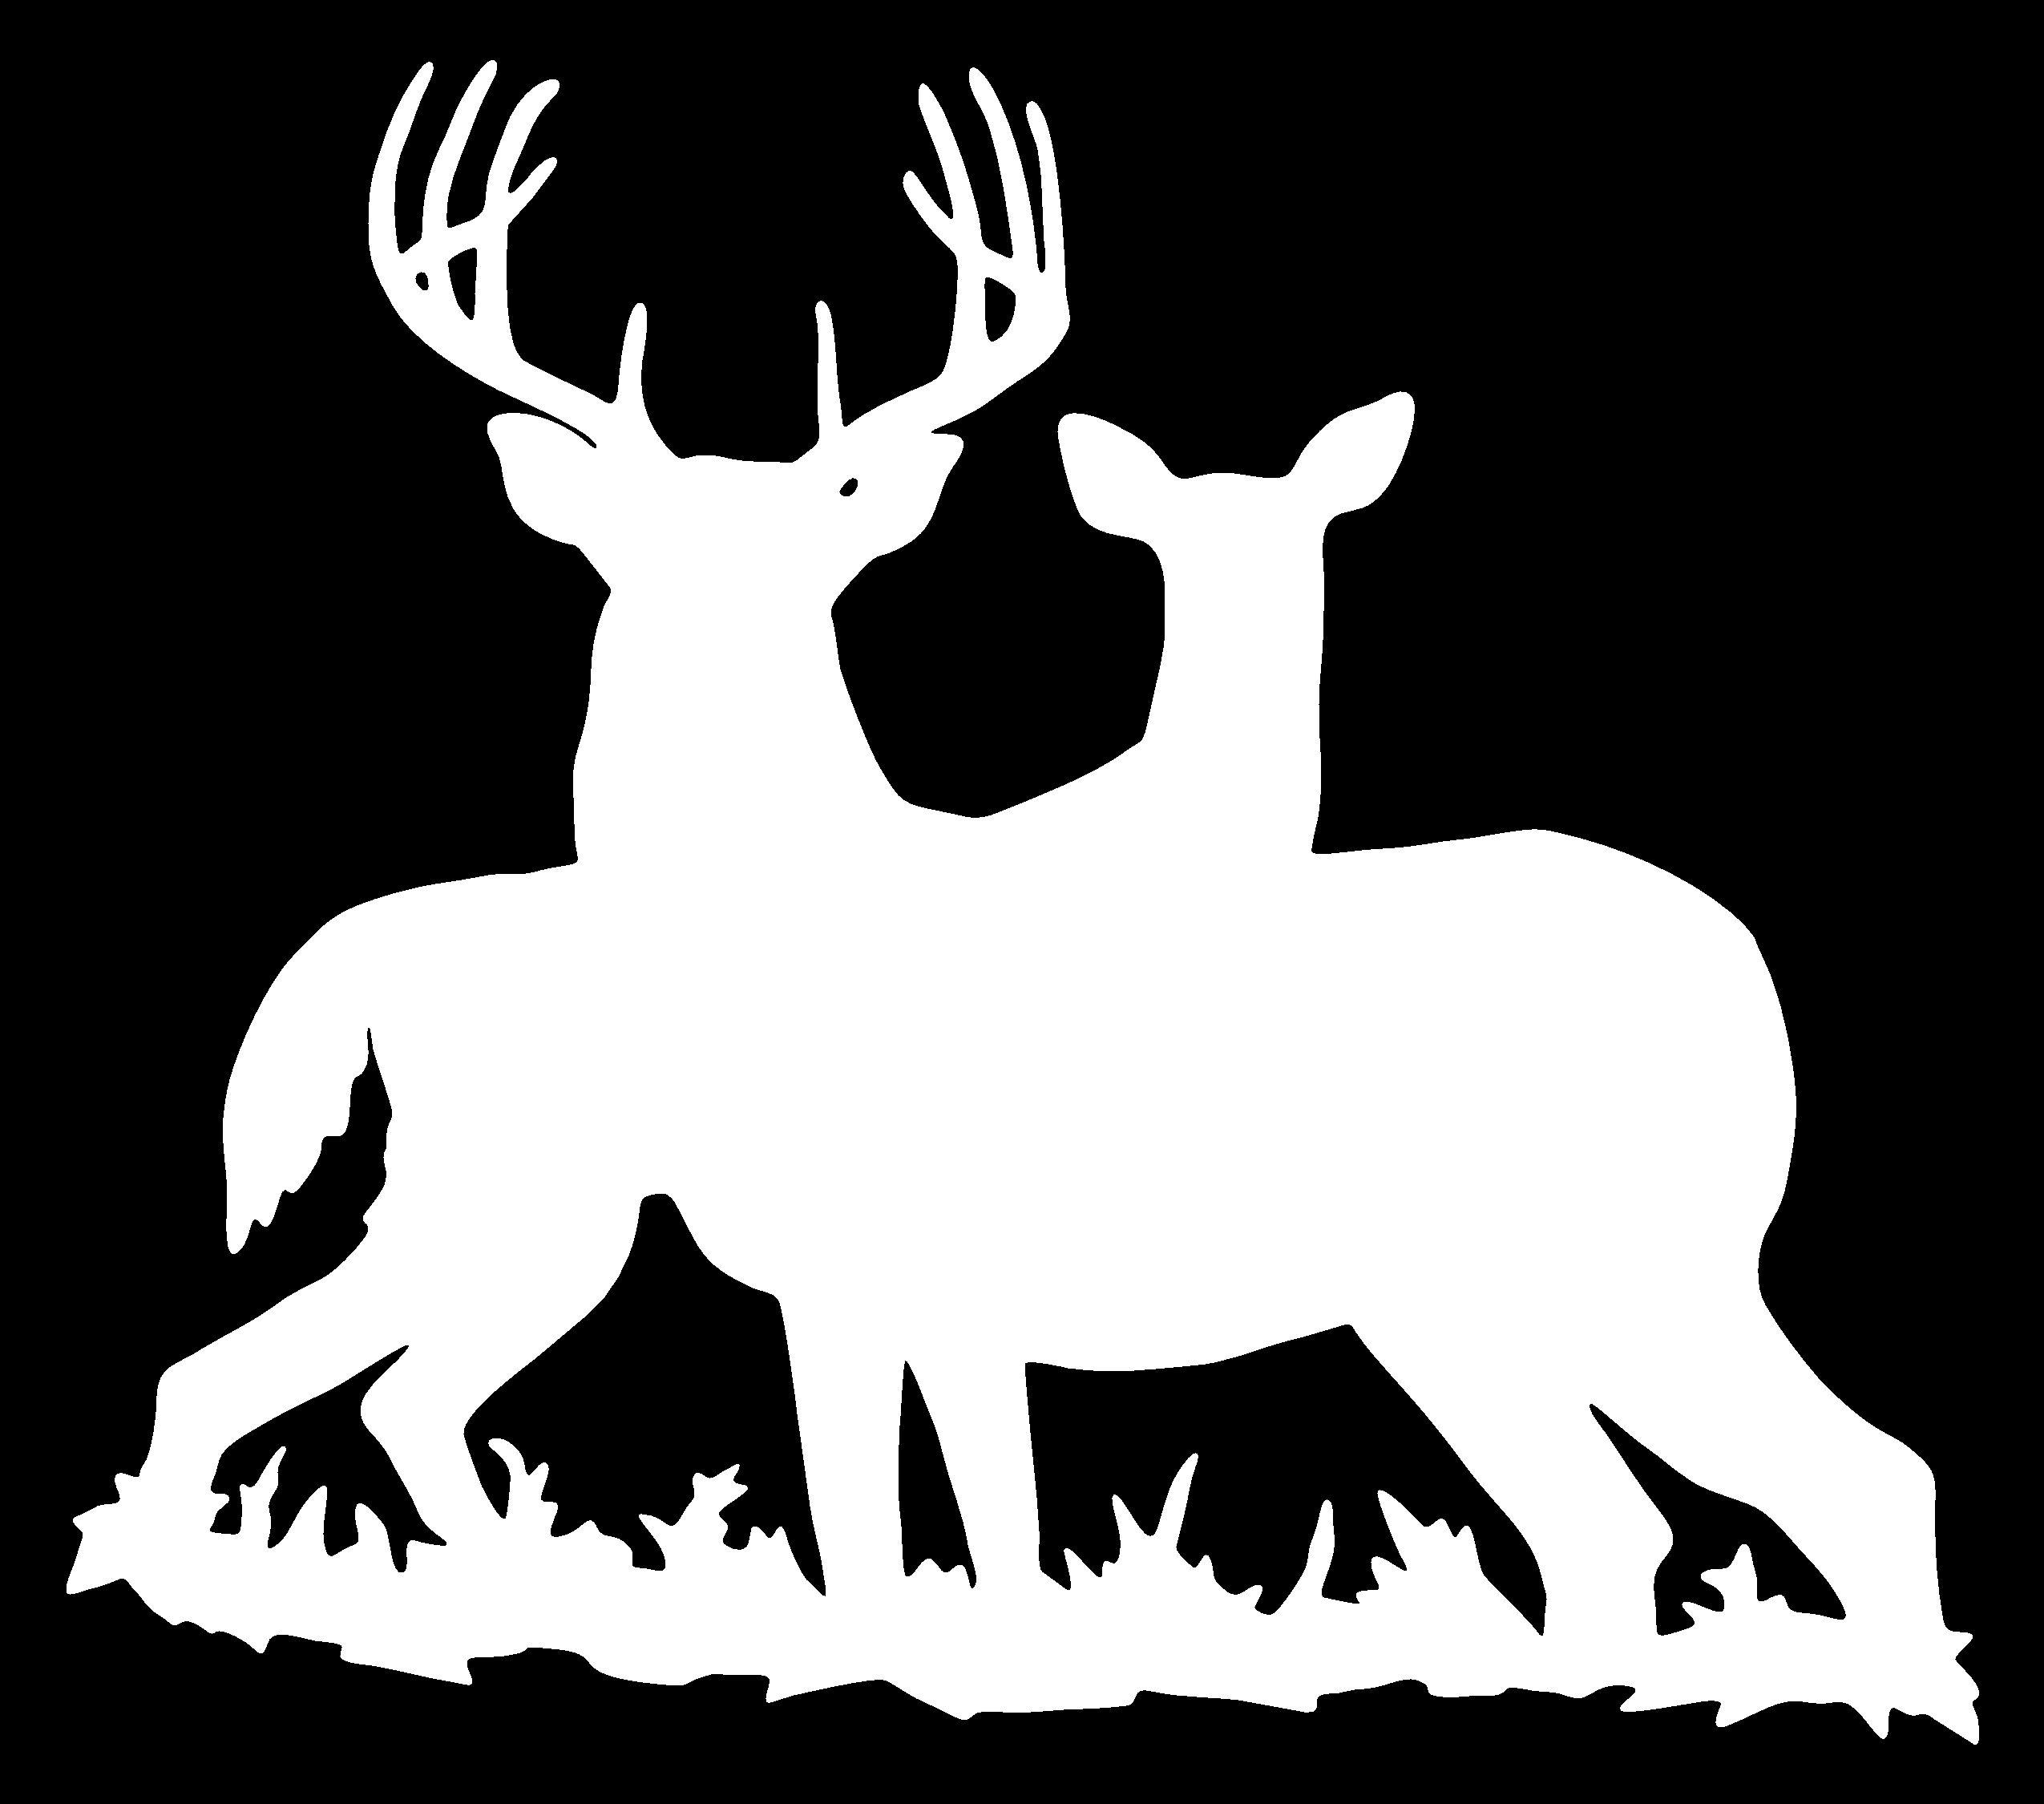 Hunting clipart car decal. Vinyl xpx deer bad